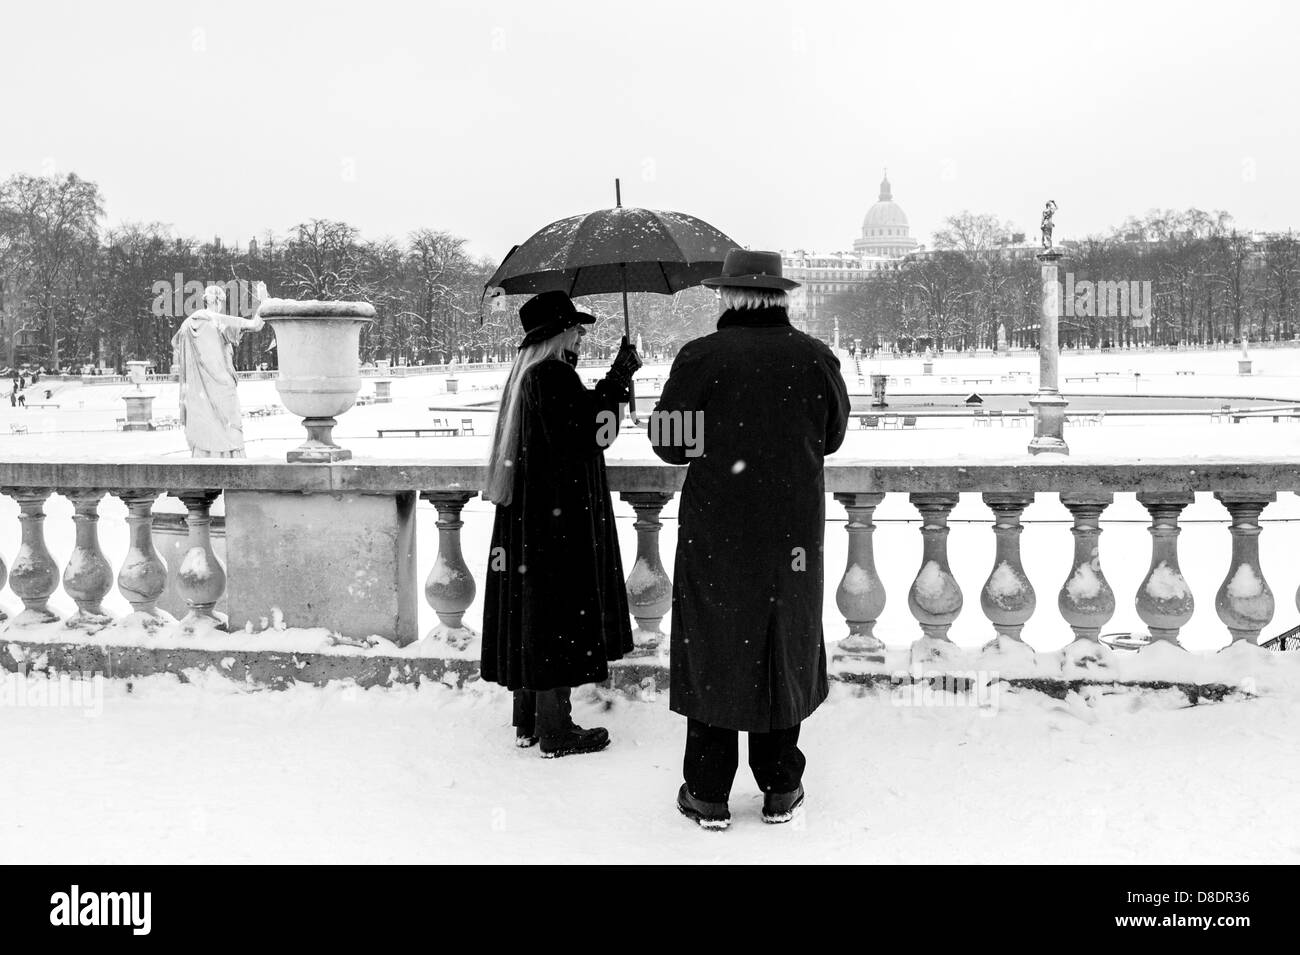 Senior couple enjoying snowy park. - Stock Image